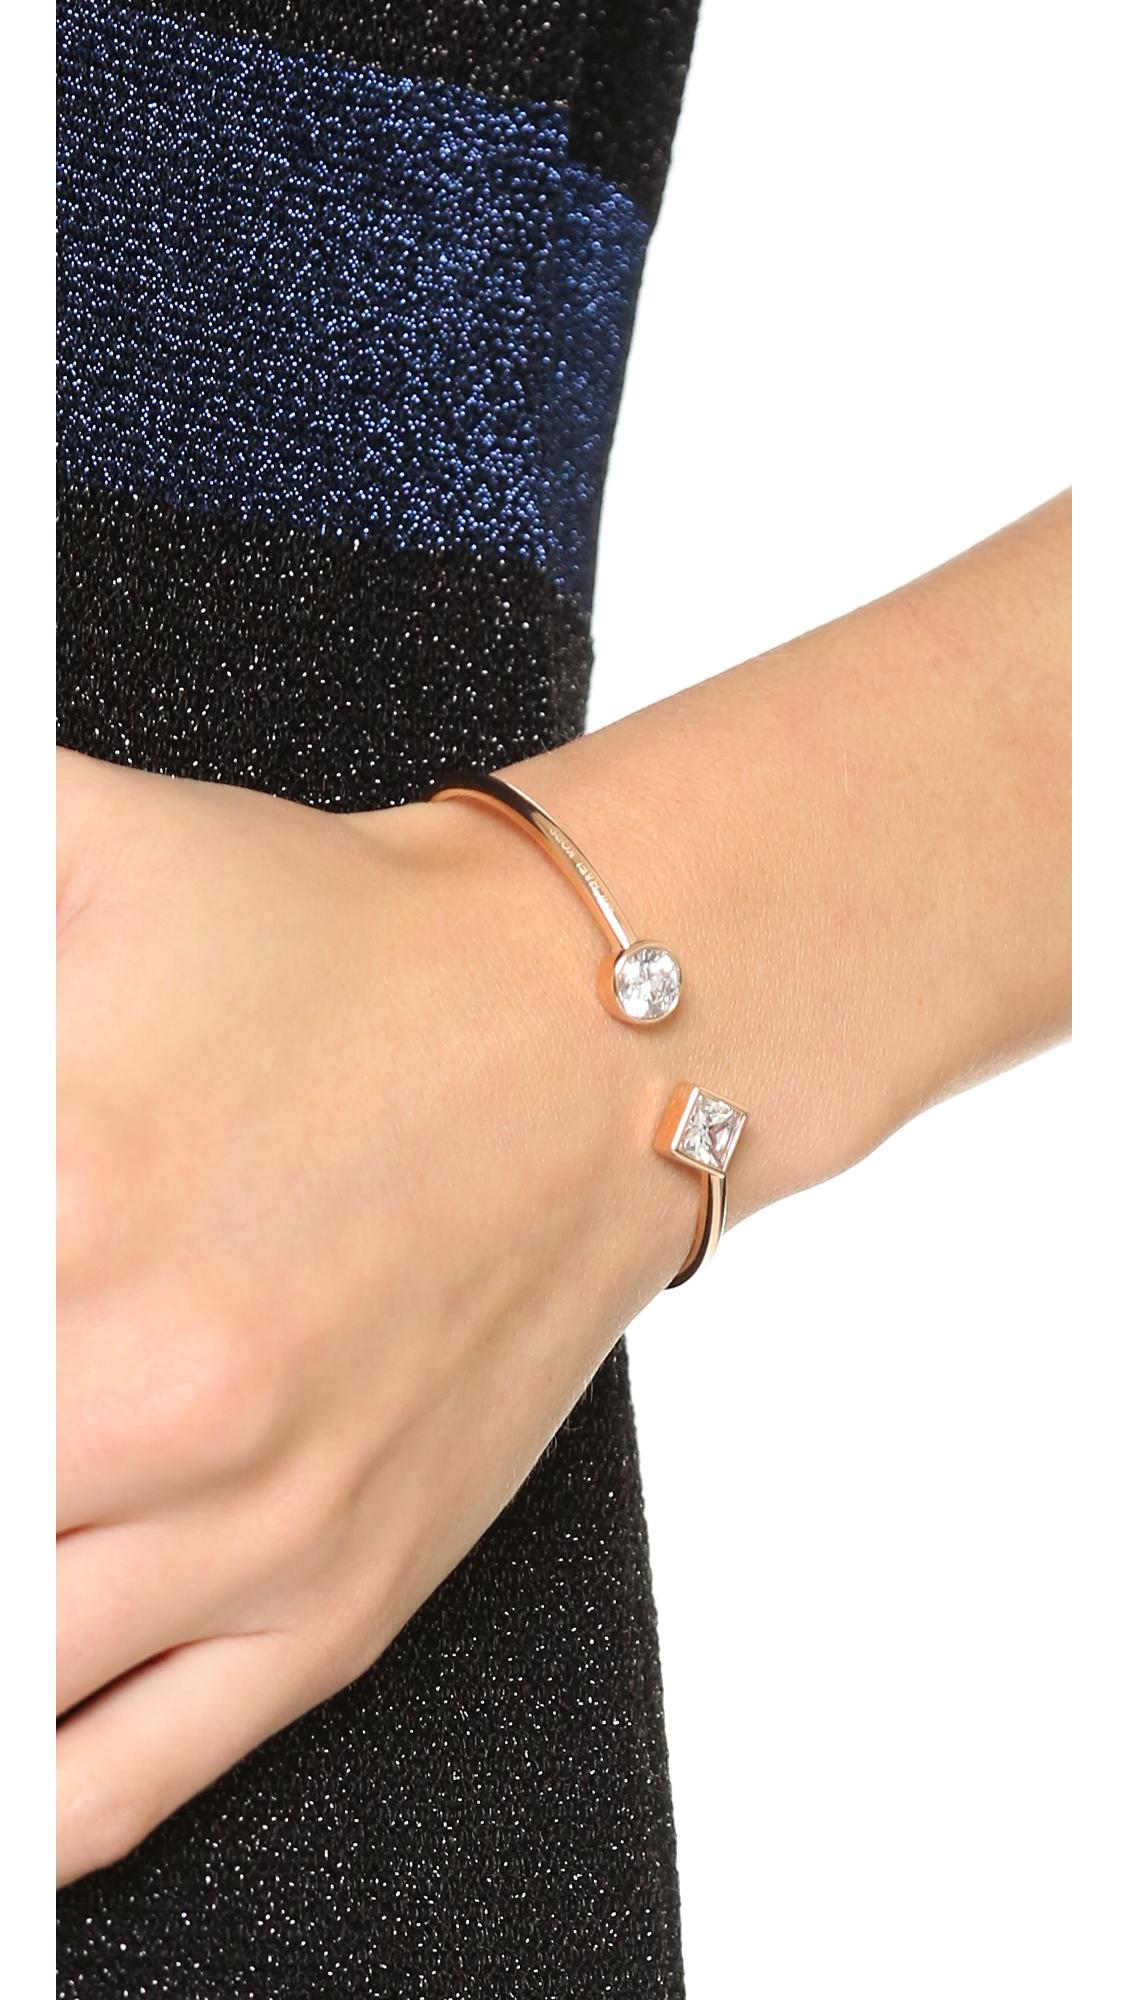 de577dafda96 Buy michael kors rose gold cuff bracelet   OFF38% Discounted